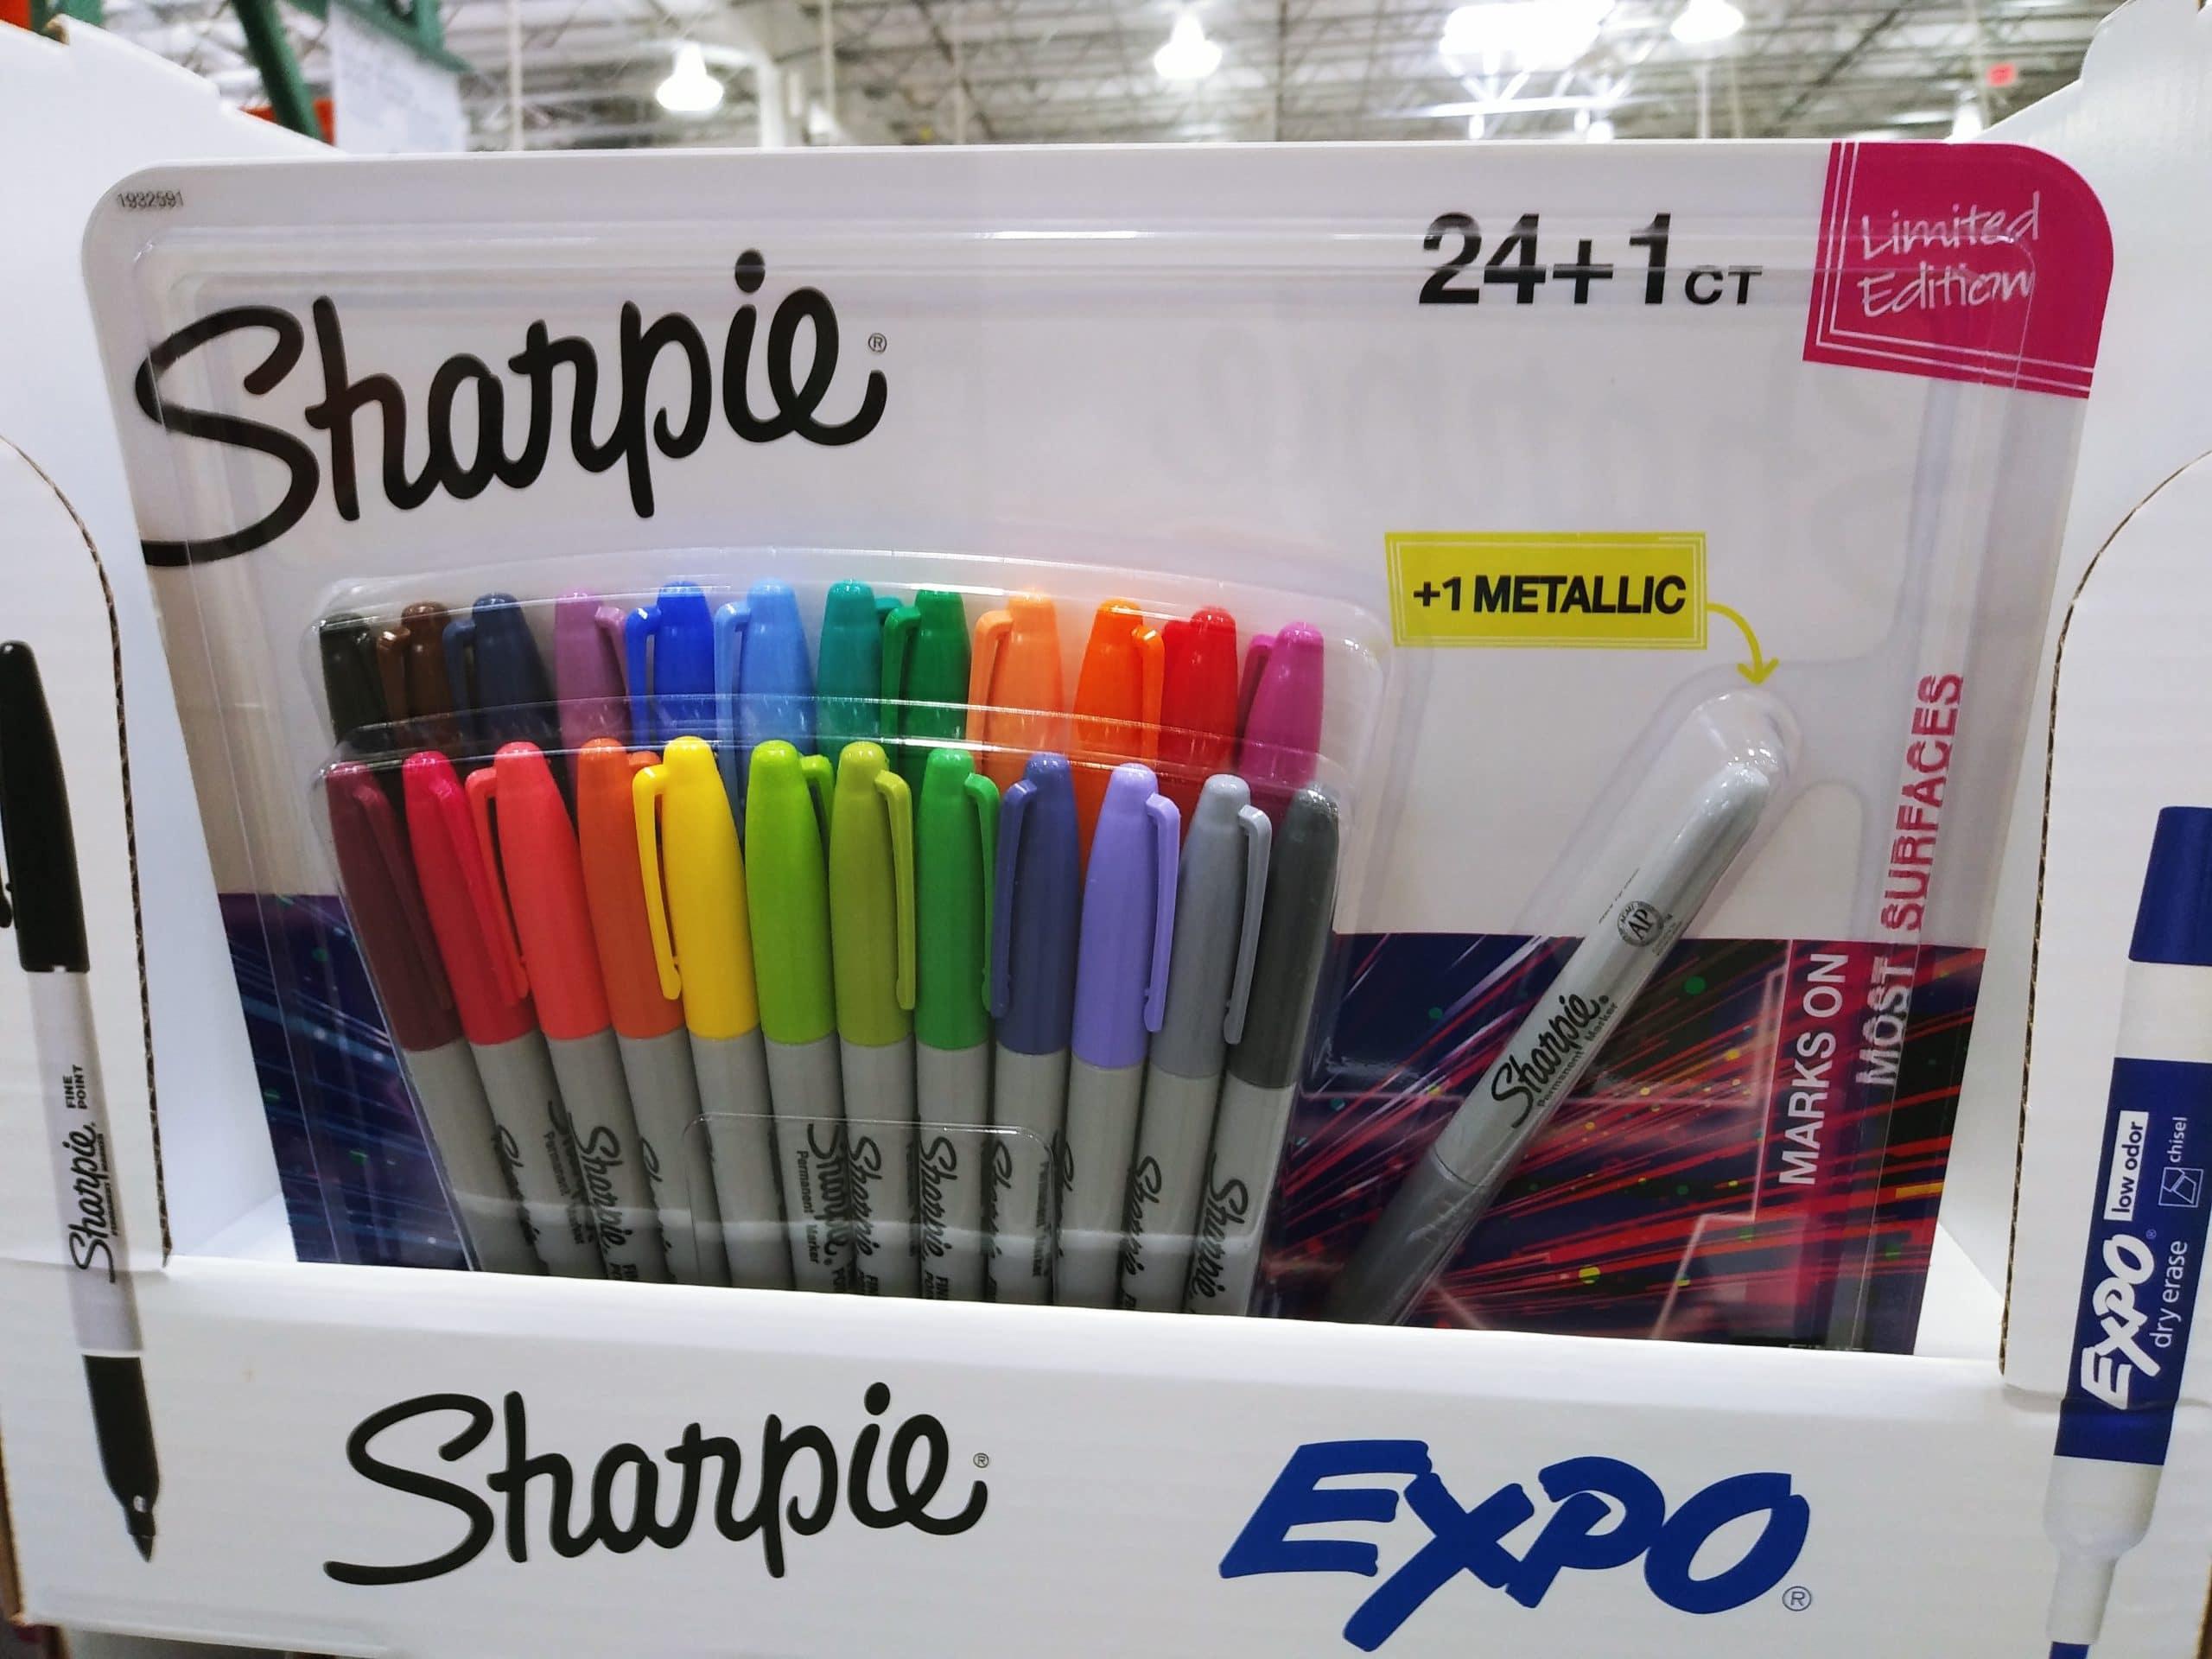 Best Permanent Markers Sharpie 25 ct $9.49